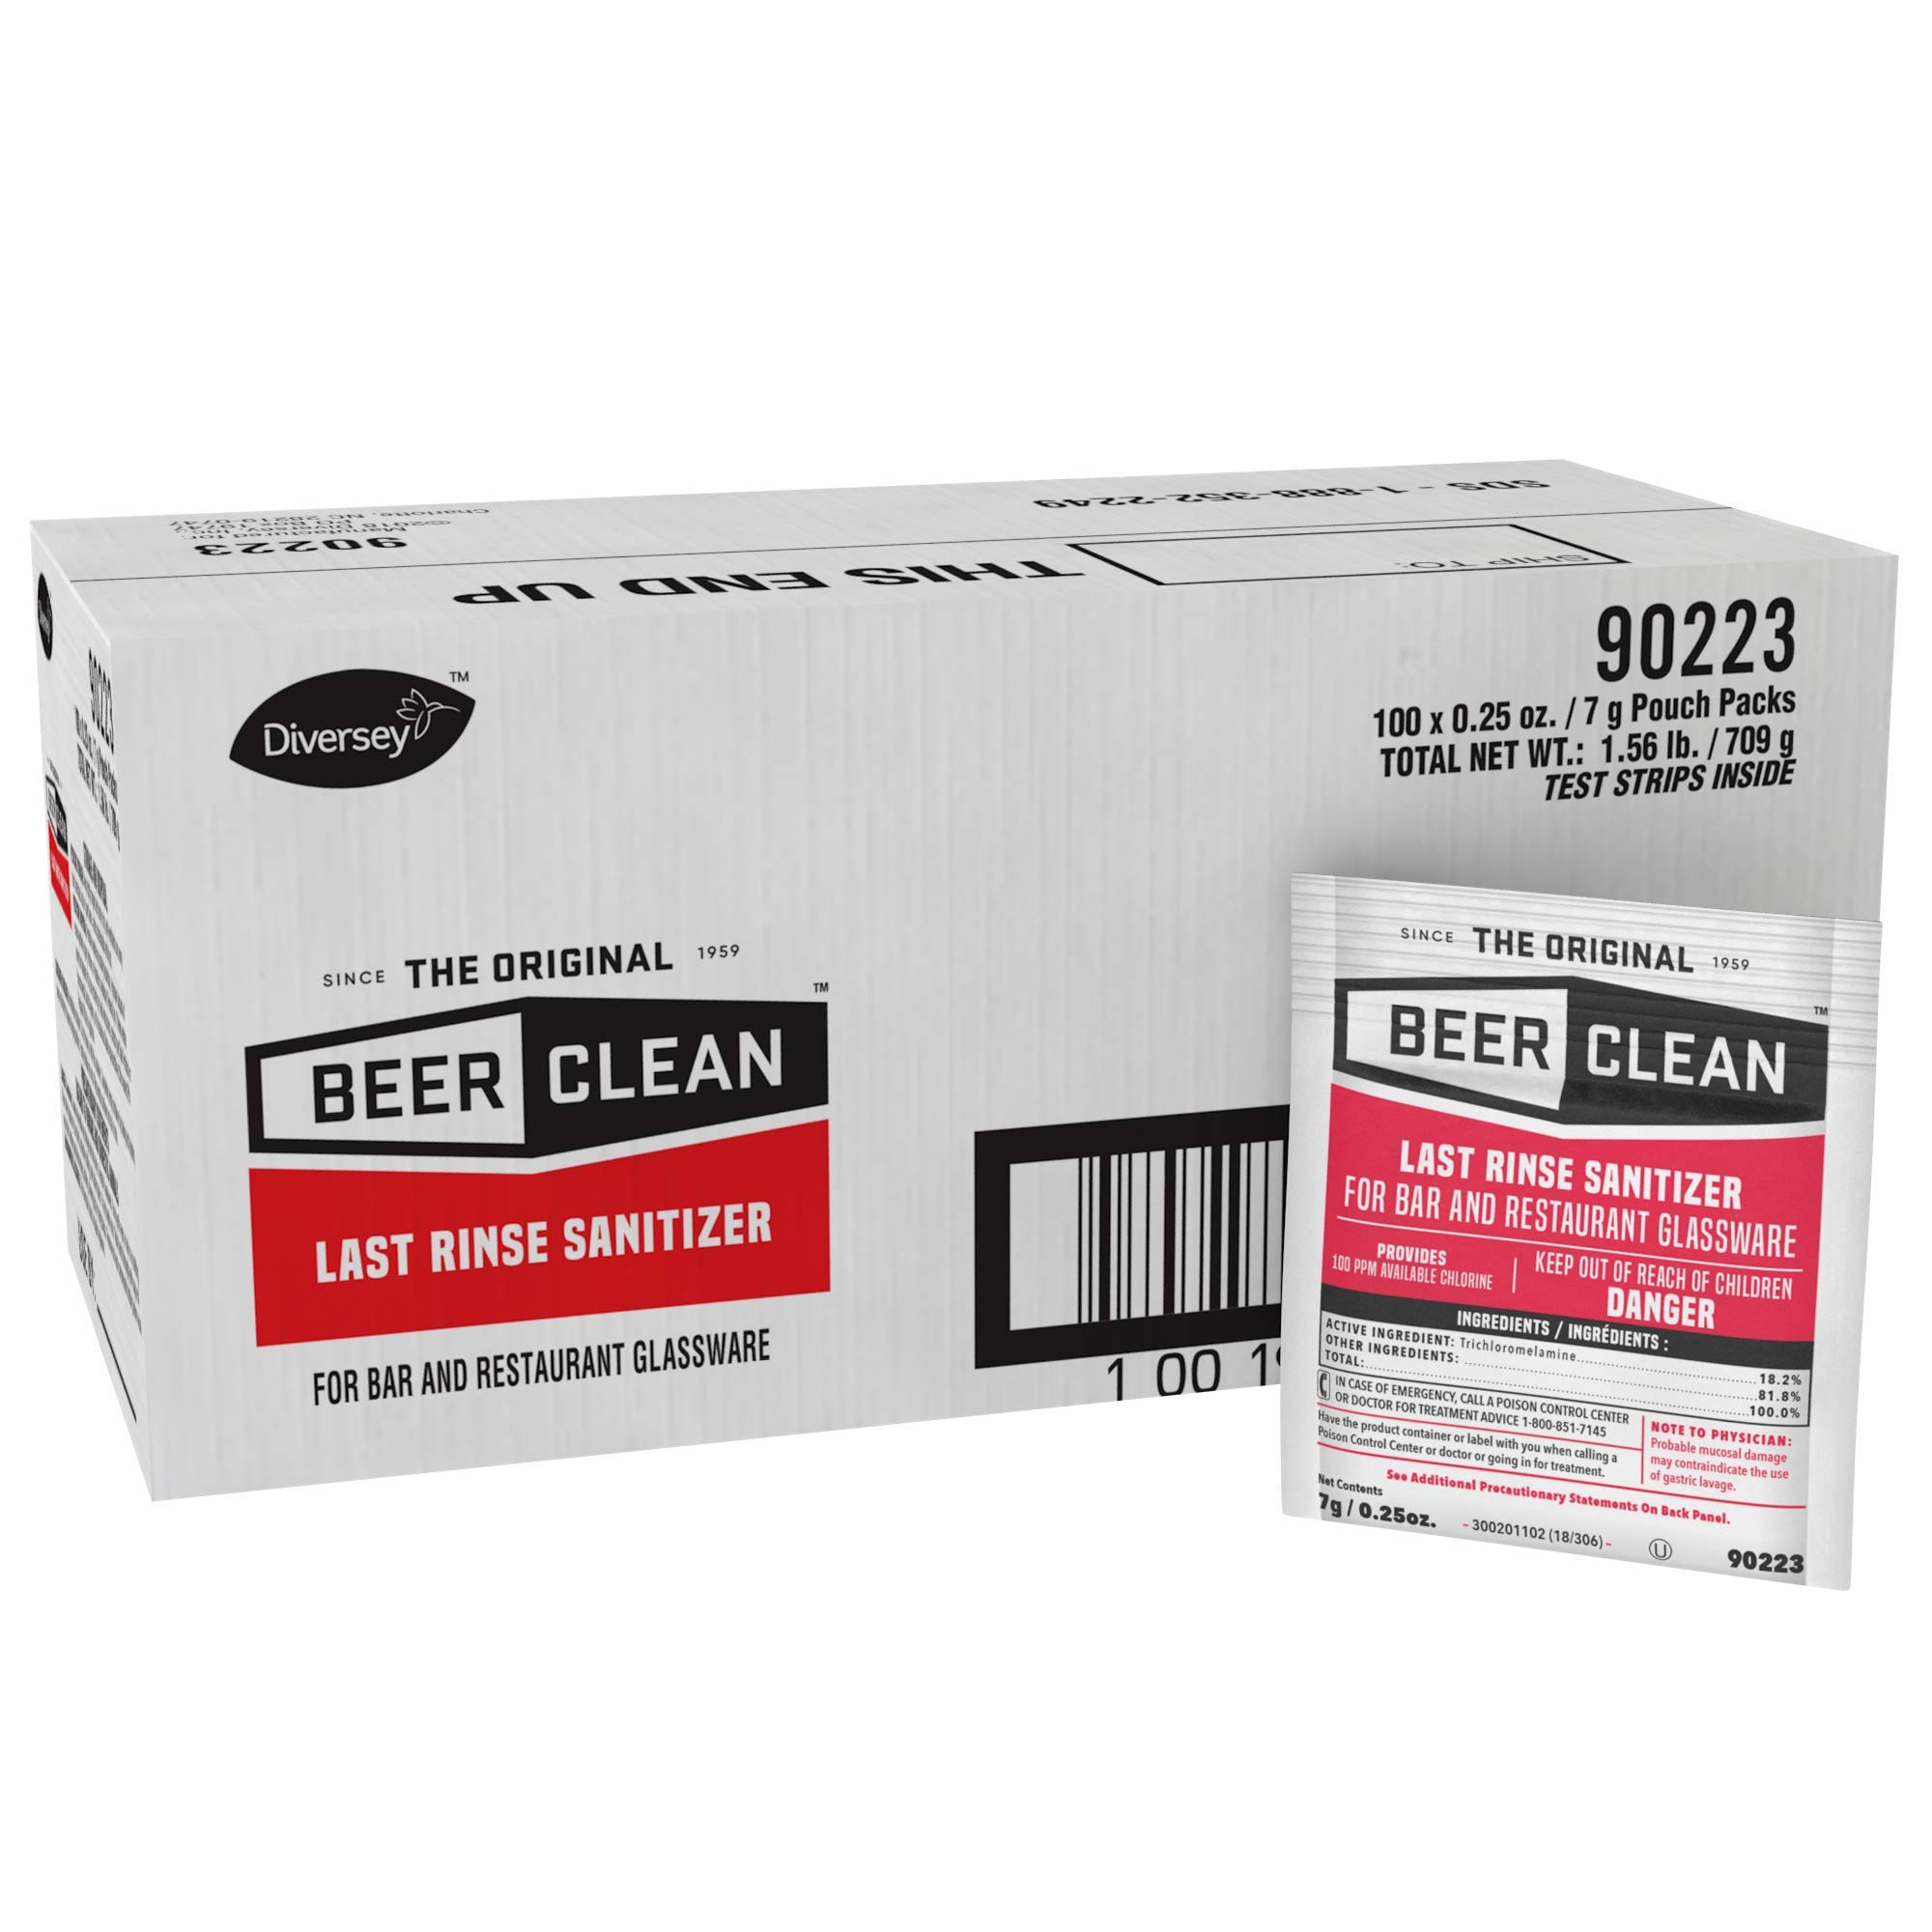 Diversey Beer Clean Last Rinse Glass Sanitizer, .25oz Powder Packet (100 Pack)